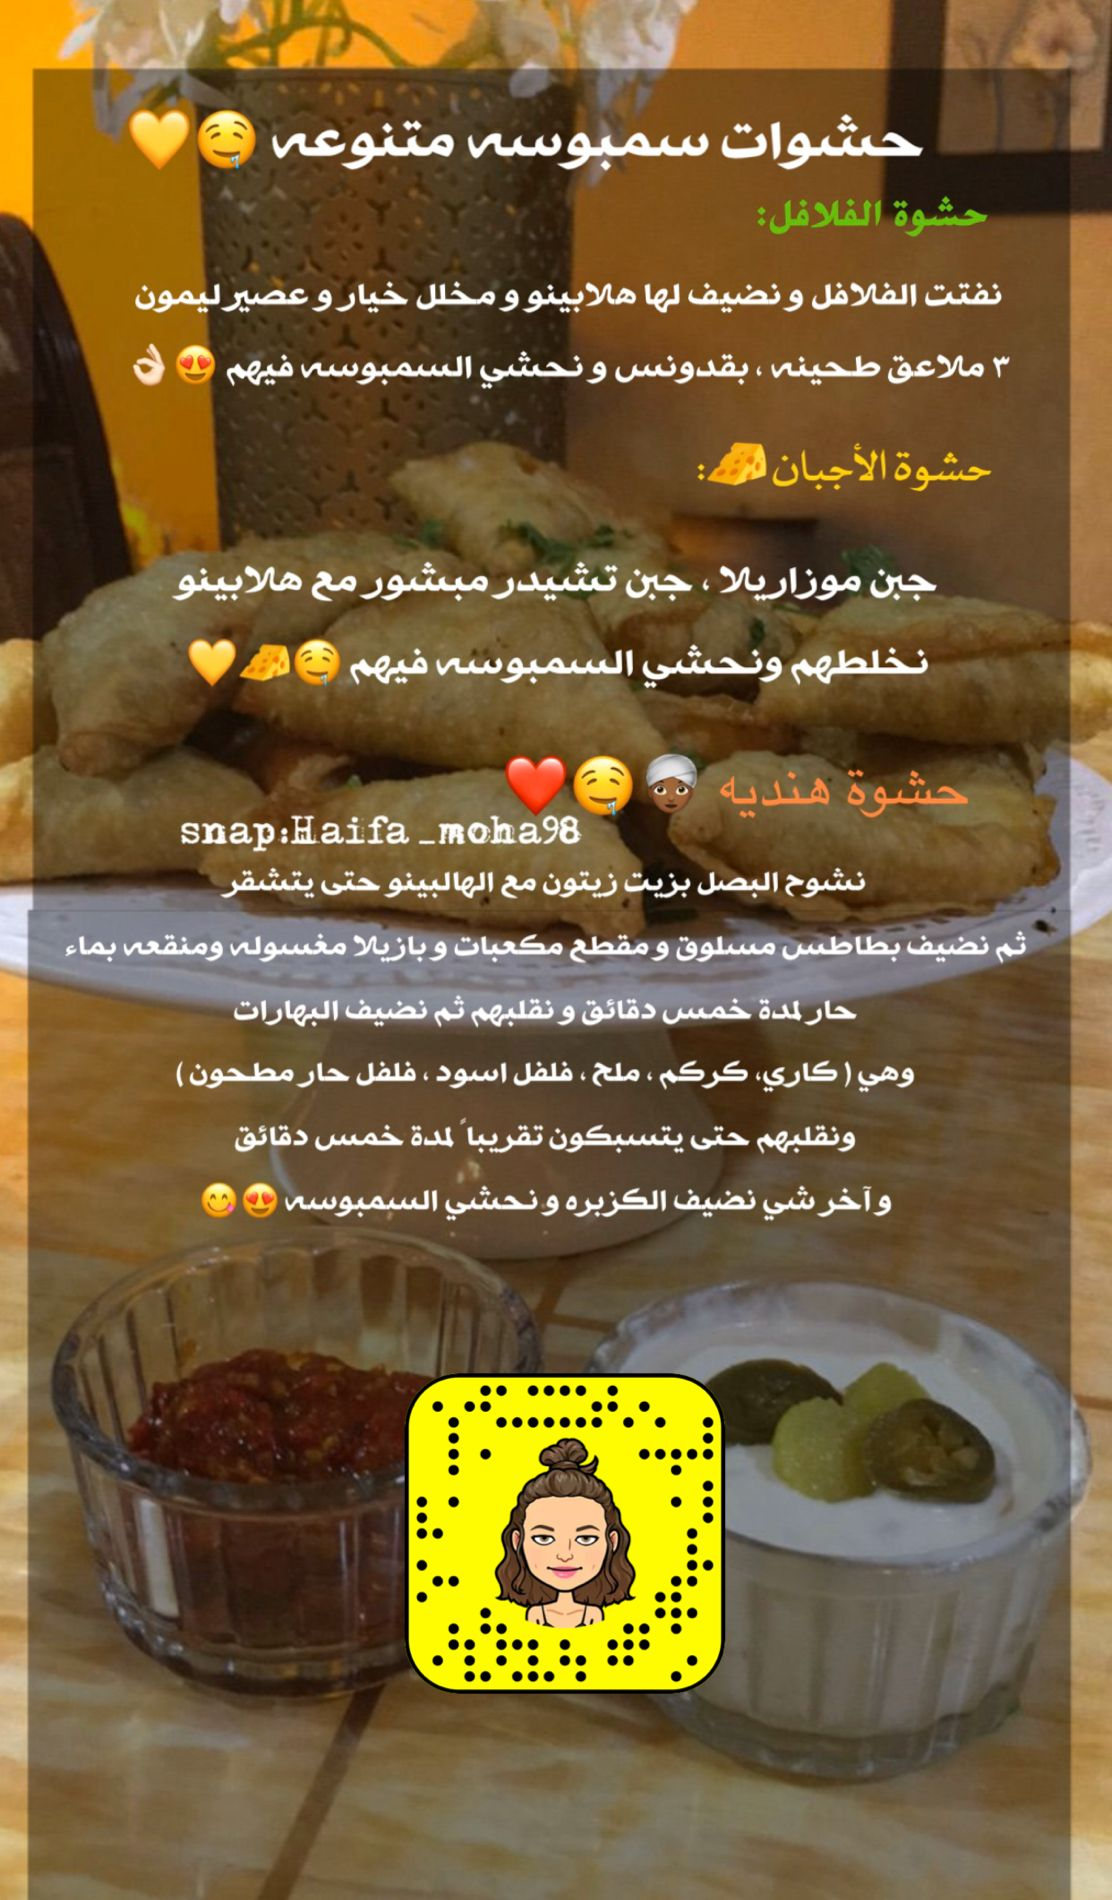 طريقة تحضير فلافل طيبة كتير Falafel Middle East Recipes Food Recipes